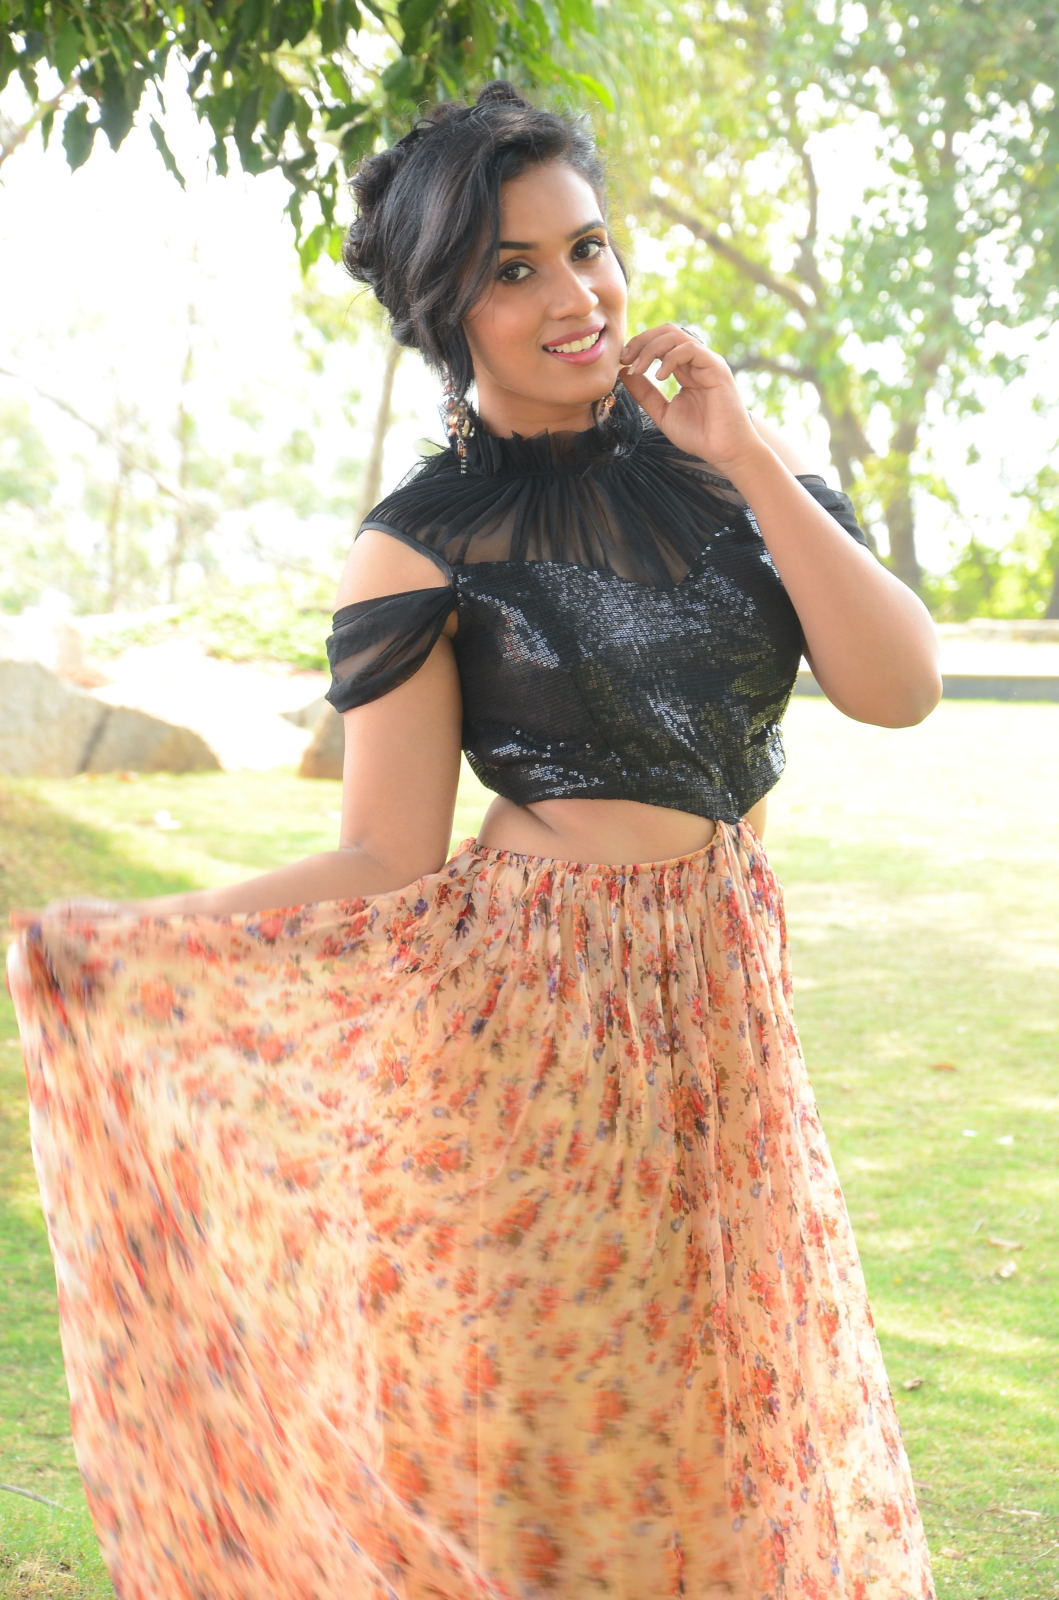 chetana uttej Brand New Photo Stills Of South Actress Chetana Uttej | Tollywood Chetana Uttej 23